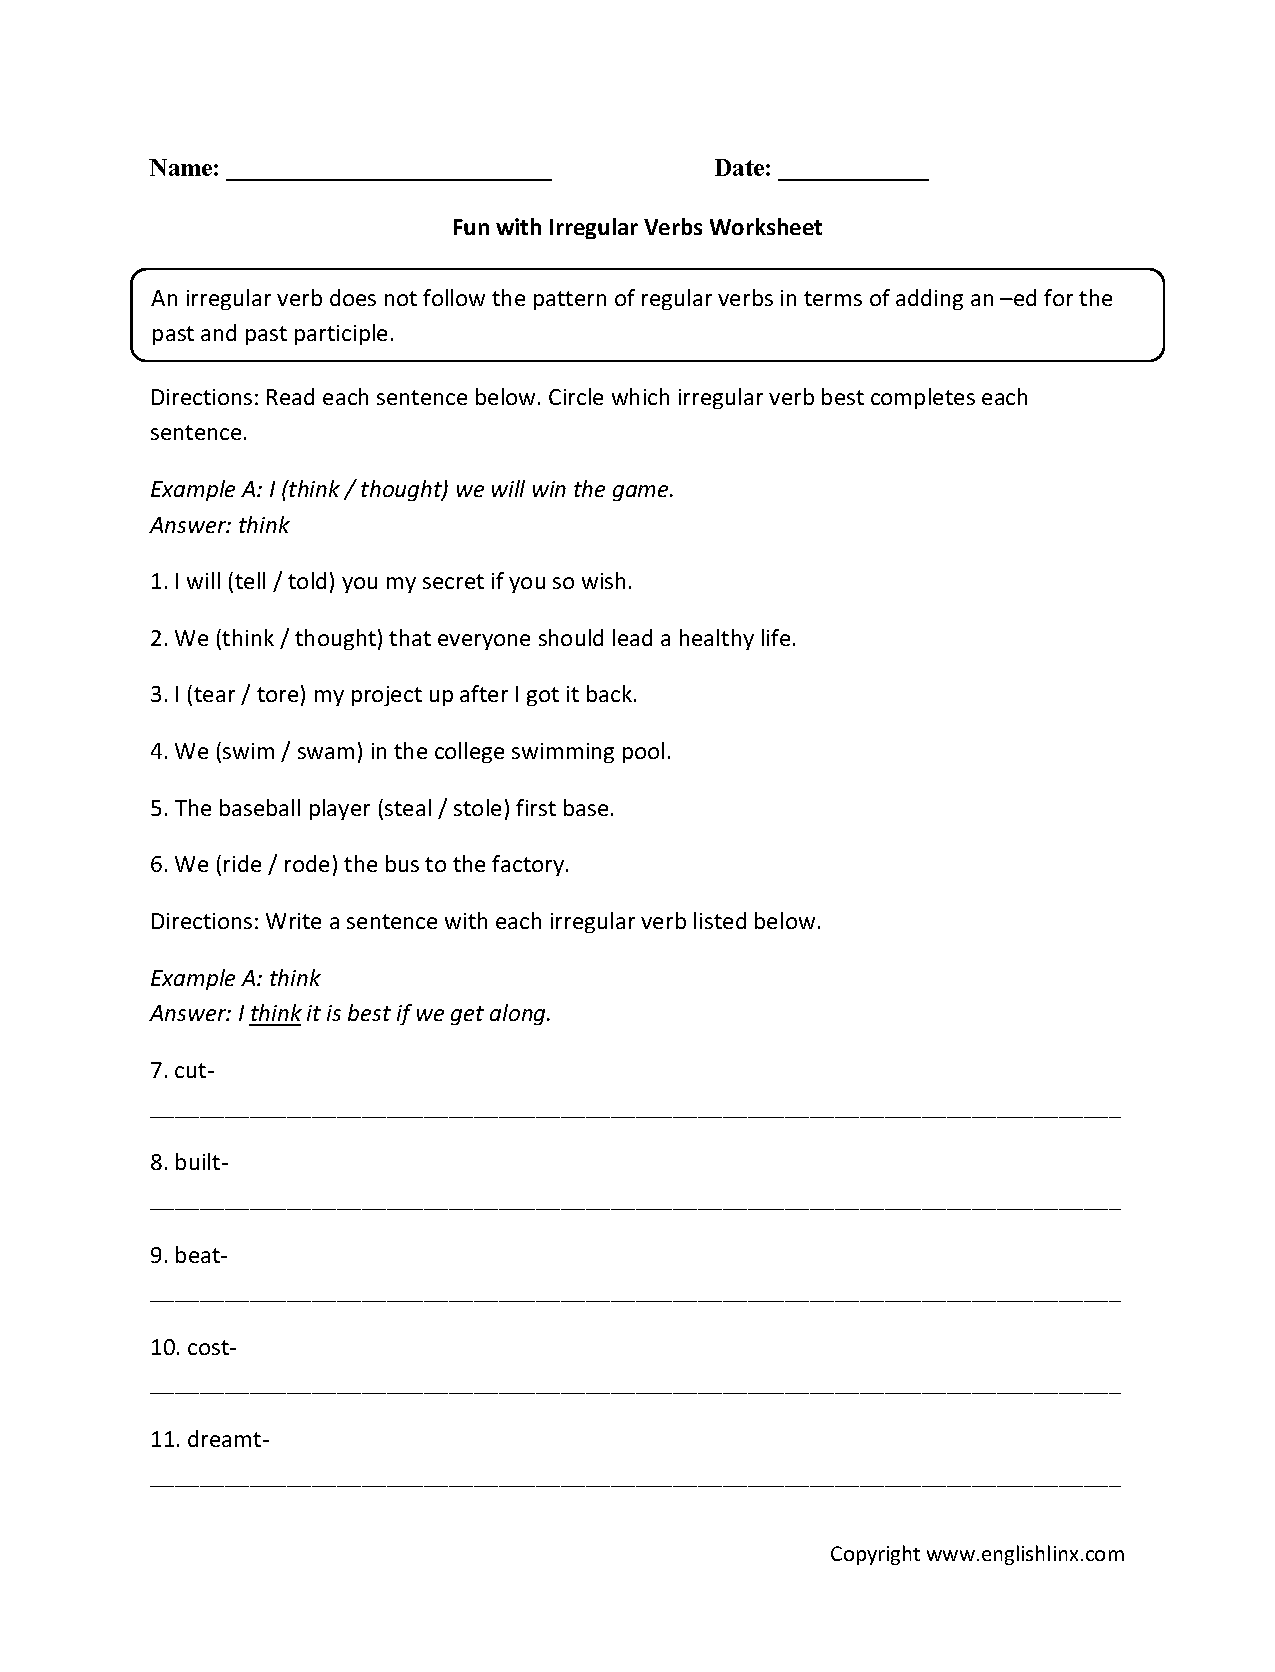 Fun With Irregular Verbs Worksheets